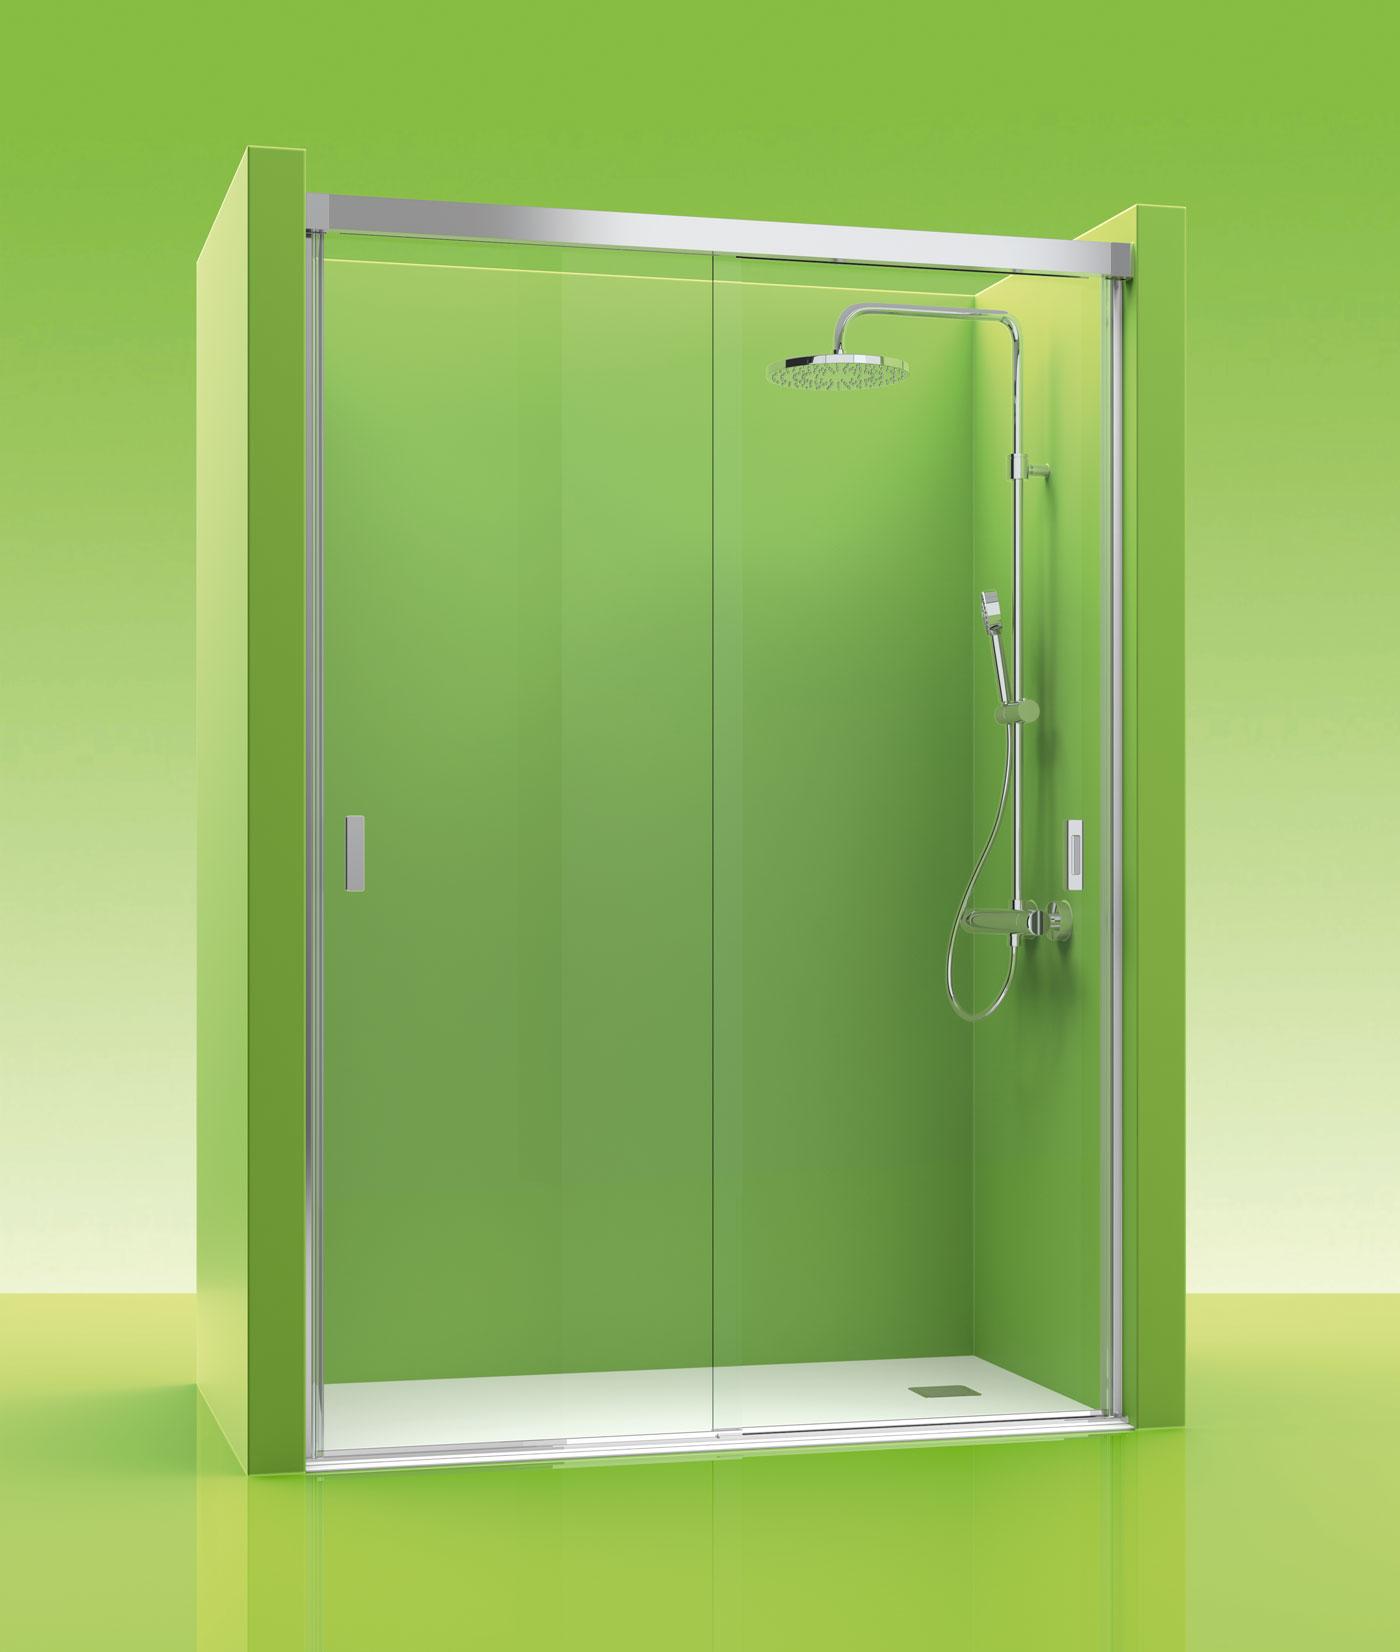 Mamparas baratas online cheap mampara de ducha frontal - Mamparas ducha online ...